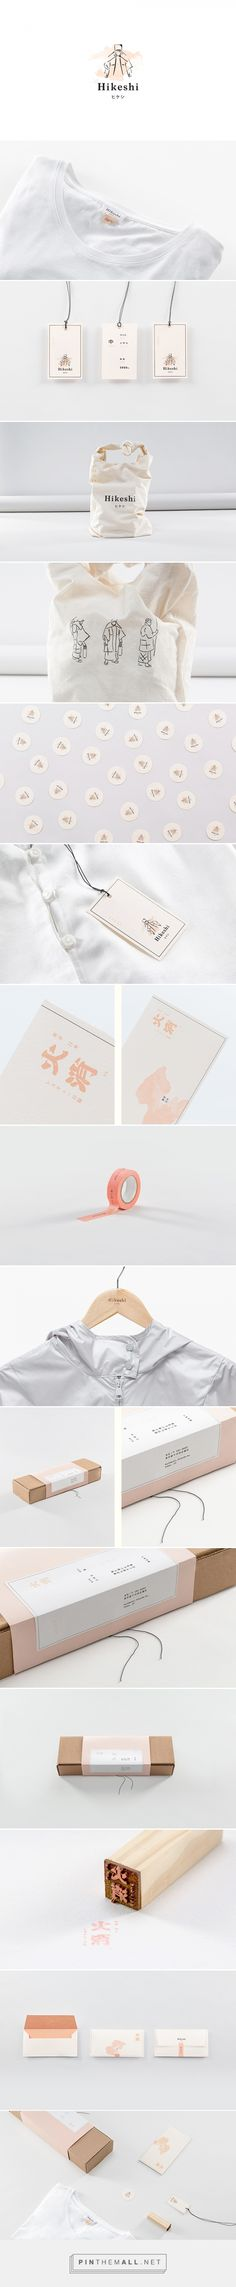 Hikeshi | Futura - created via http://pinthemall.net